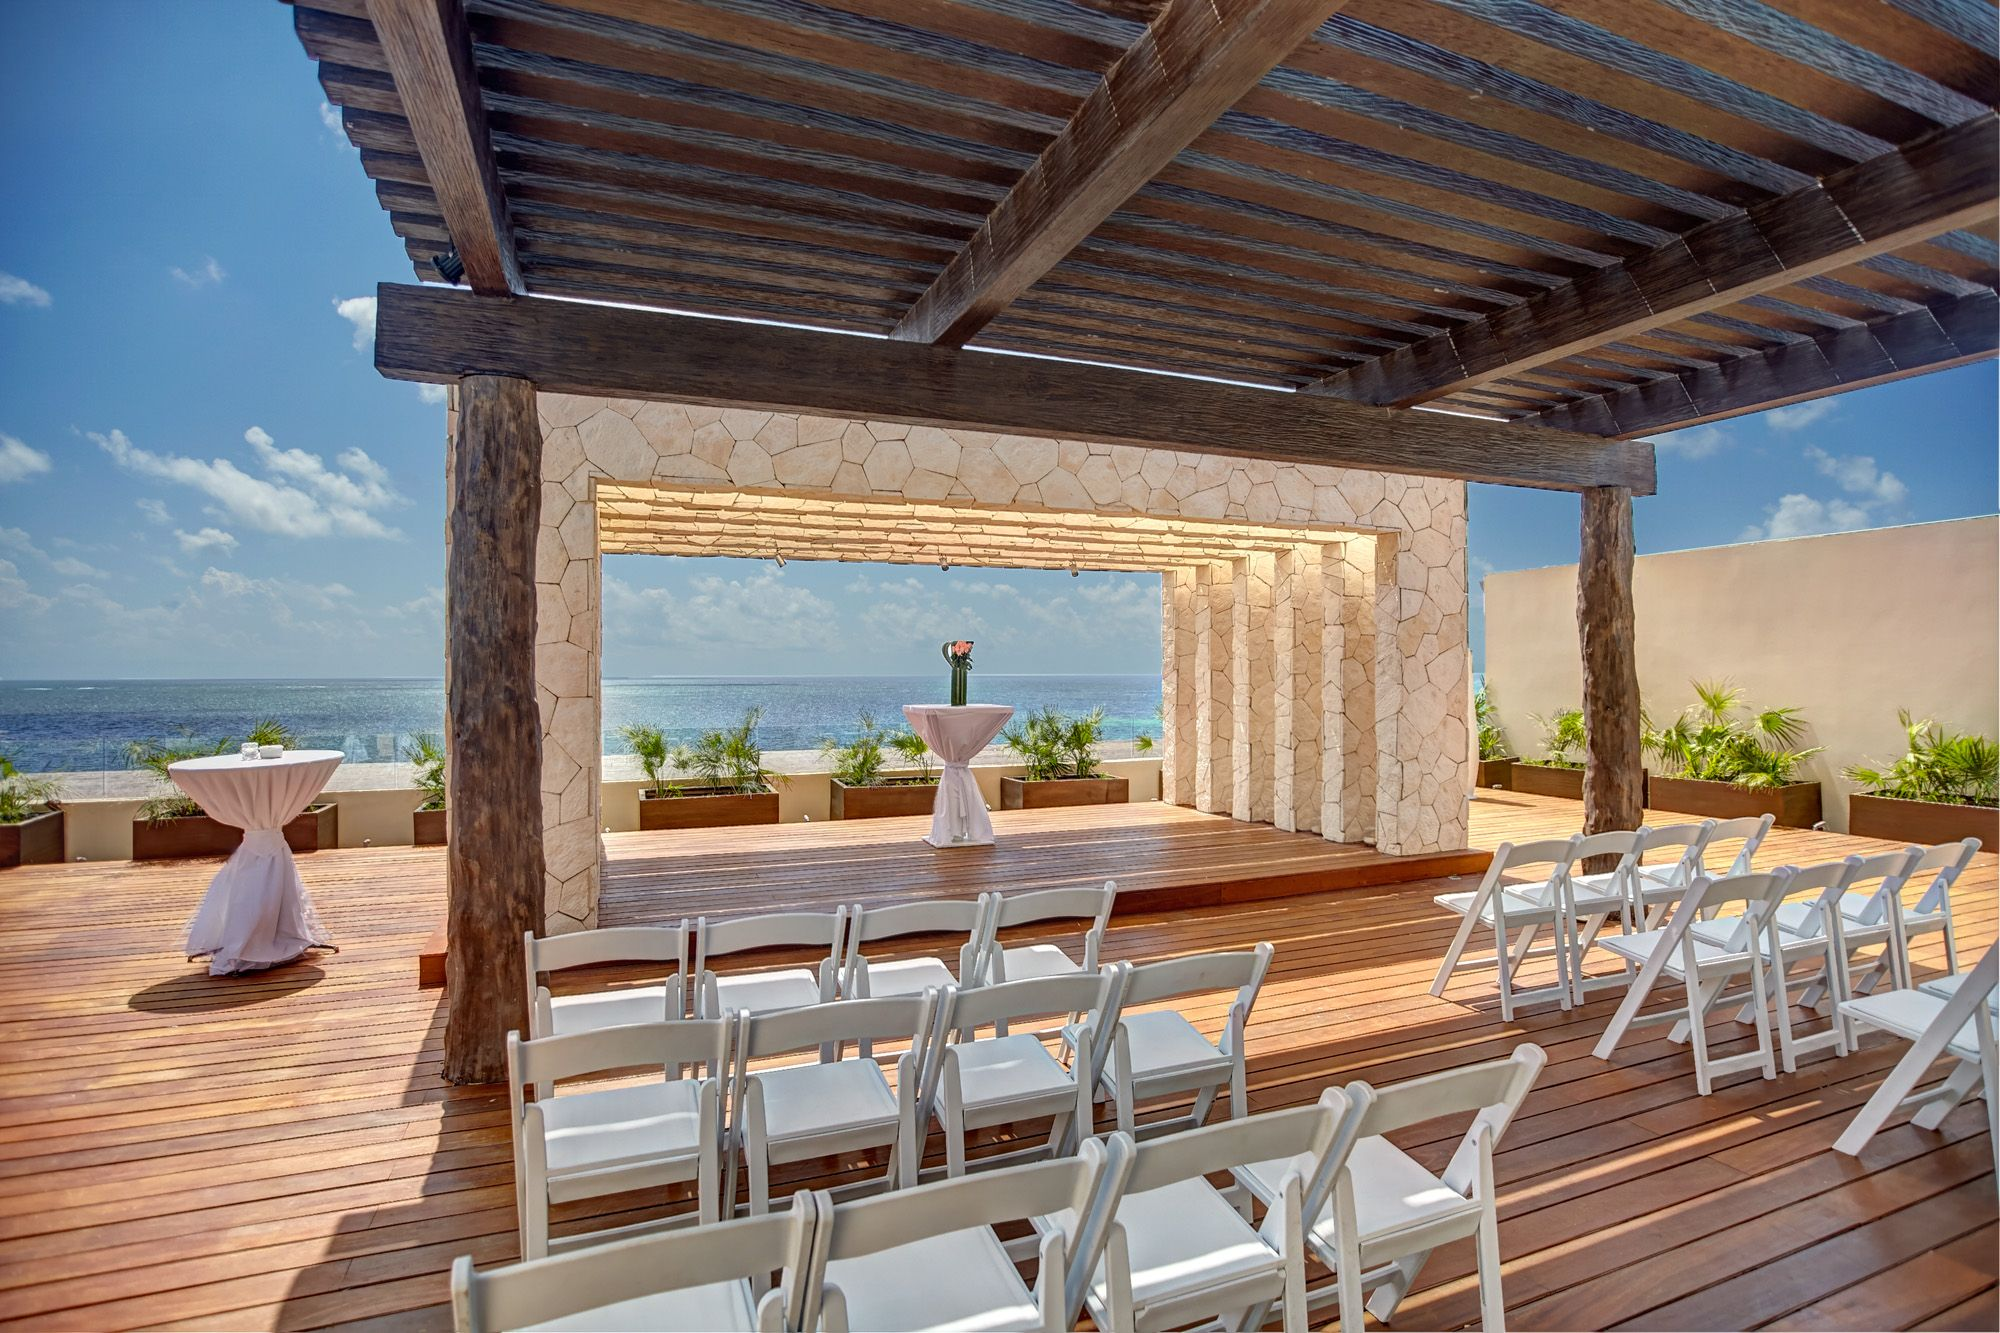 Royalton Riviera Cancun Sky Terrace Wedding (Hideaway